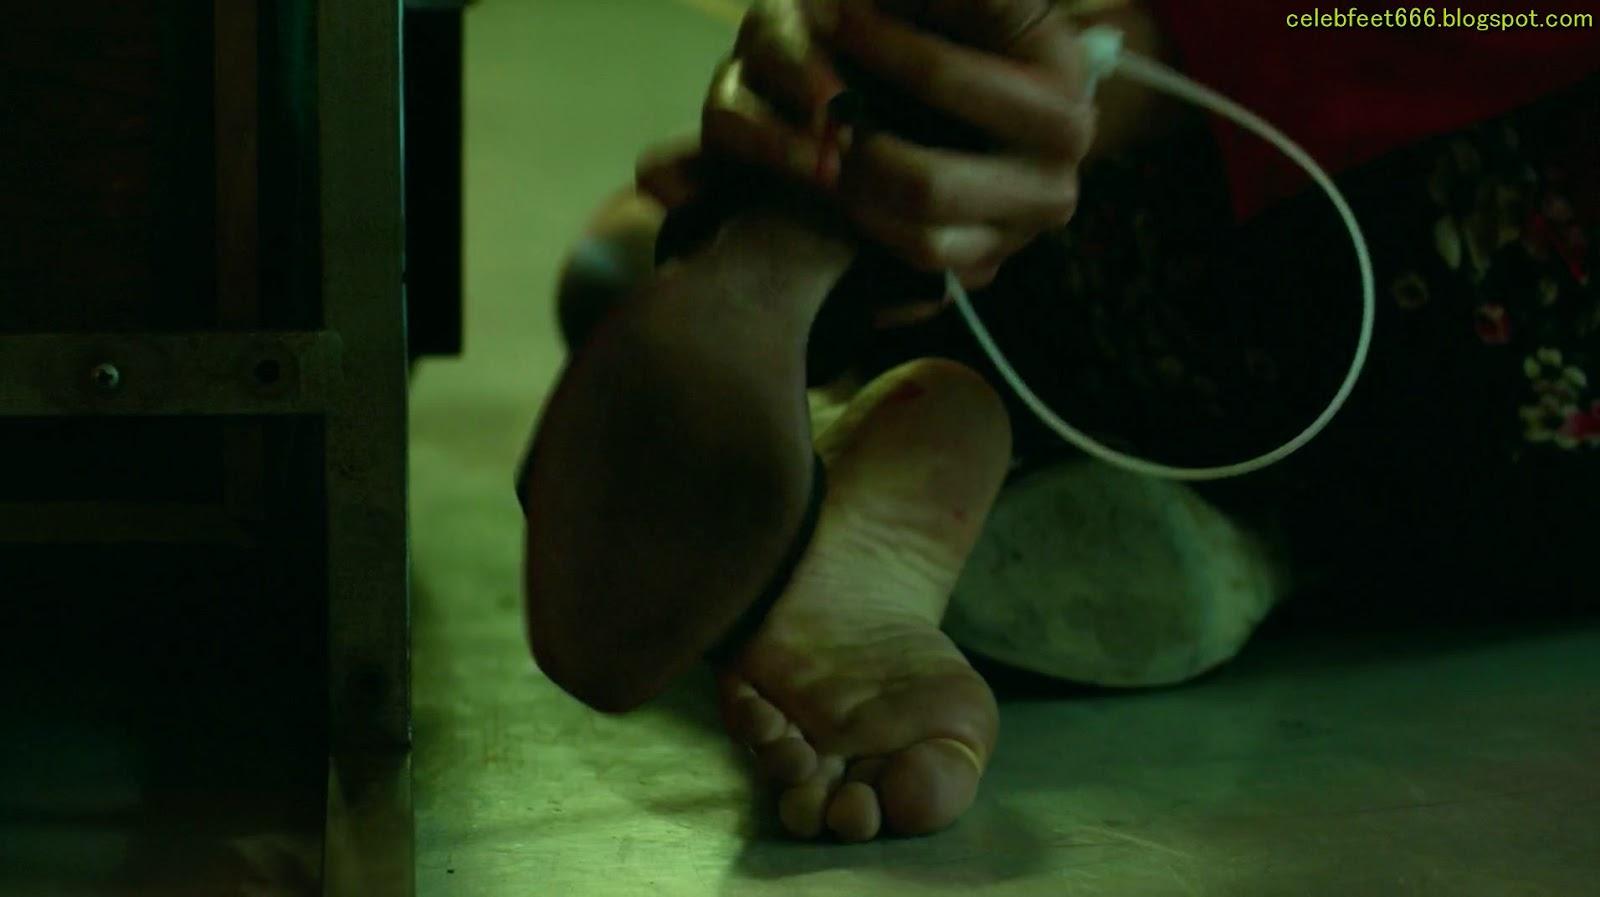 75m To Feet Celeb Feet Barbara Palvin Feet Celeb Feet